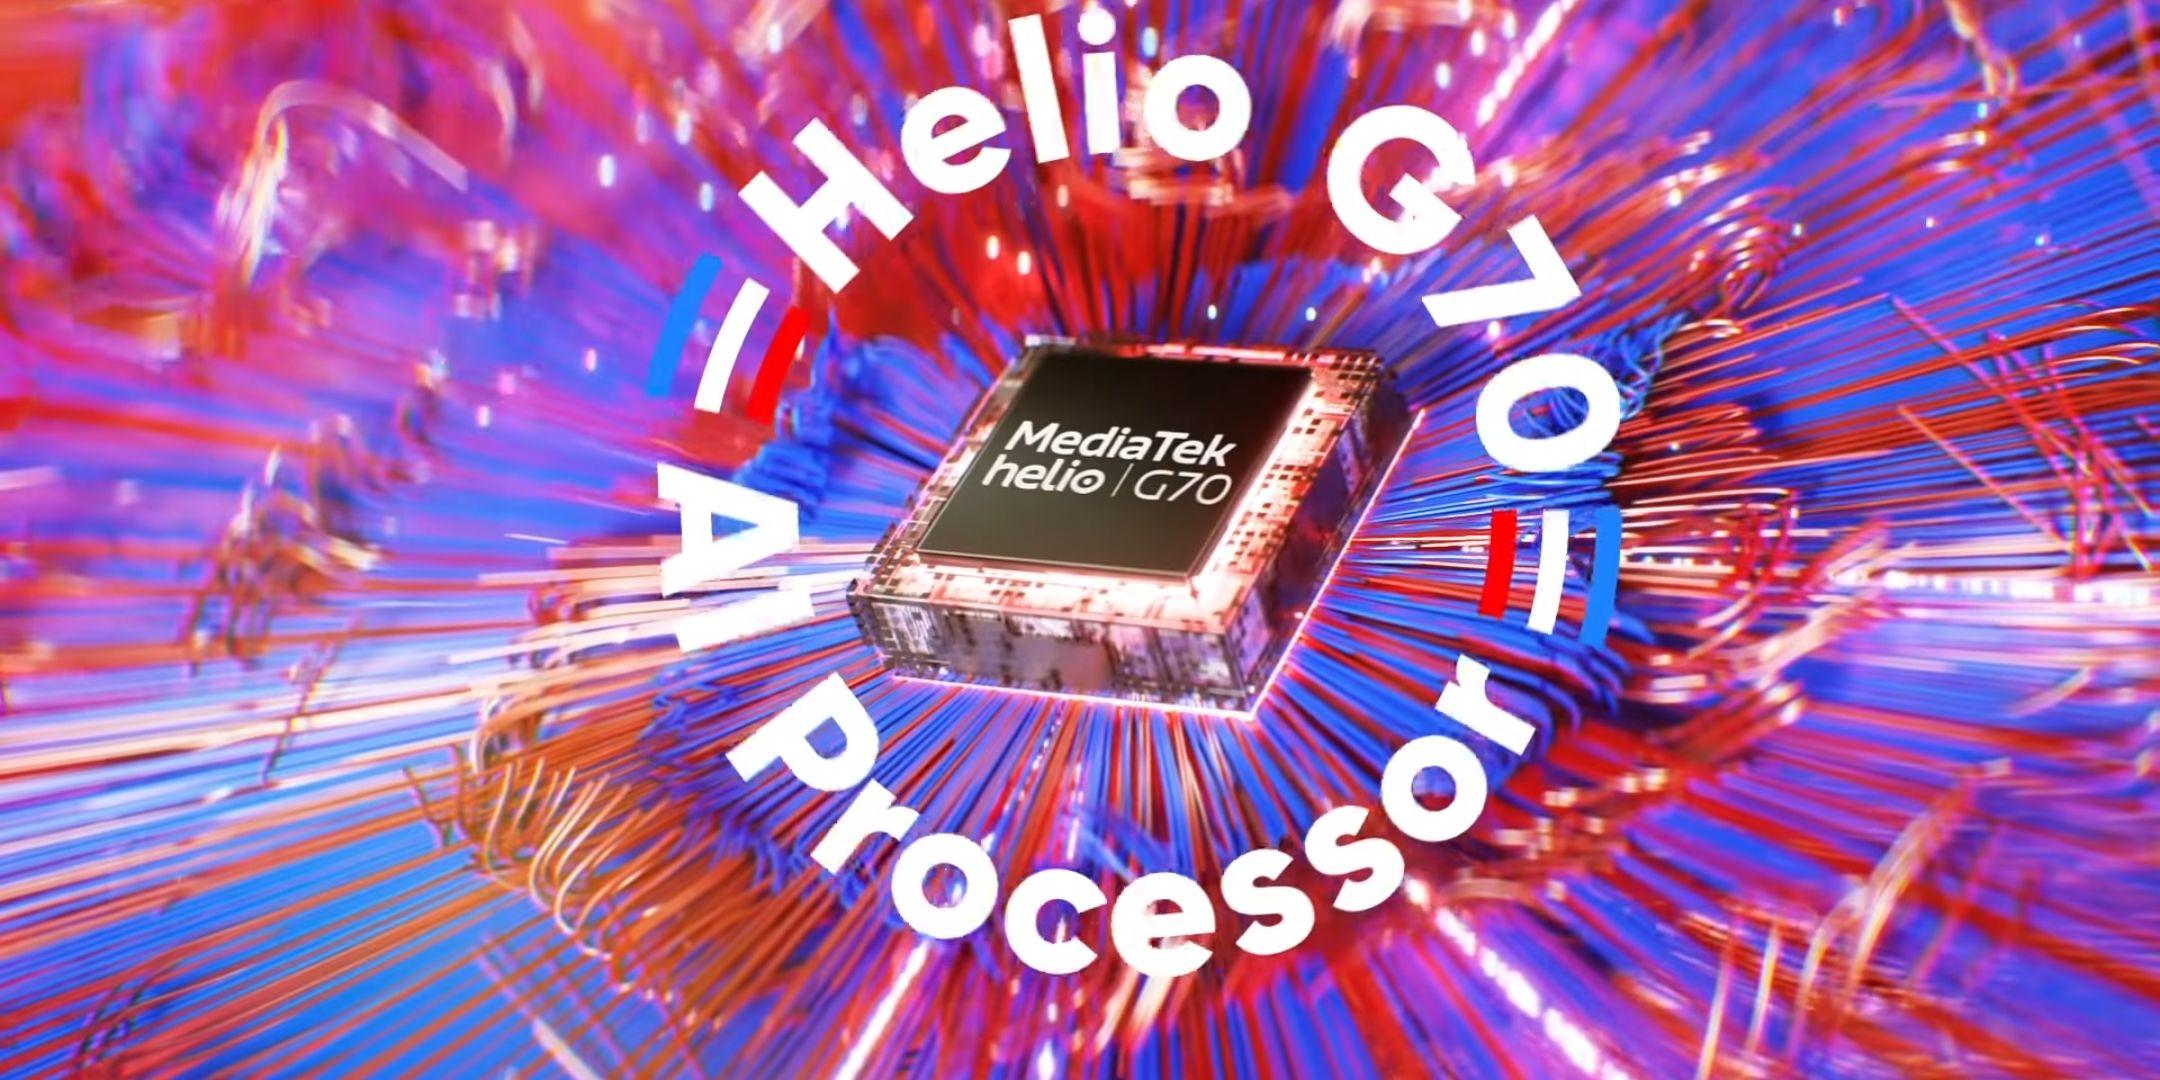 MediaTek Helio G70のベンチマークスコアが判明、Helio G90T、Snapdragon 665、Exynos 9611、Kirin 810と比較